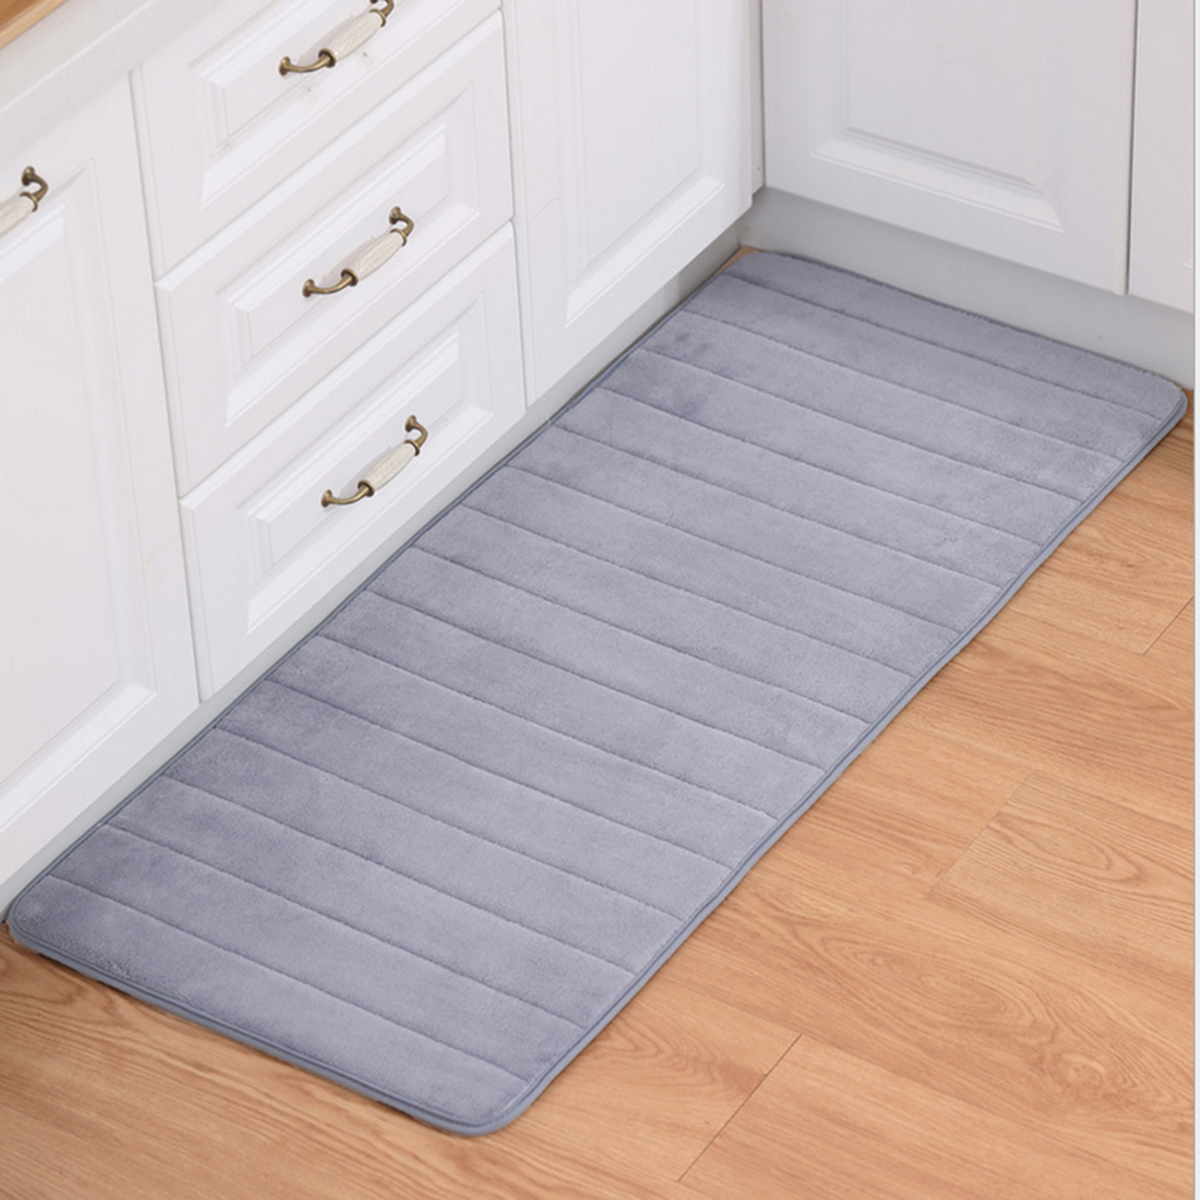 Details about Absorbent Memory Foam Bath Mat Kitchen Carpet Non-Slip Rug  Soft Bathroom Carpet